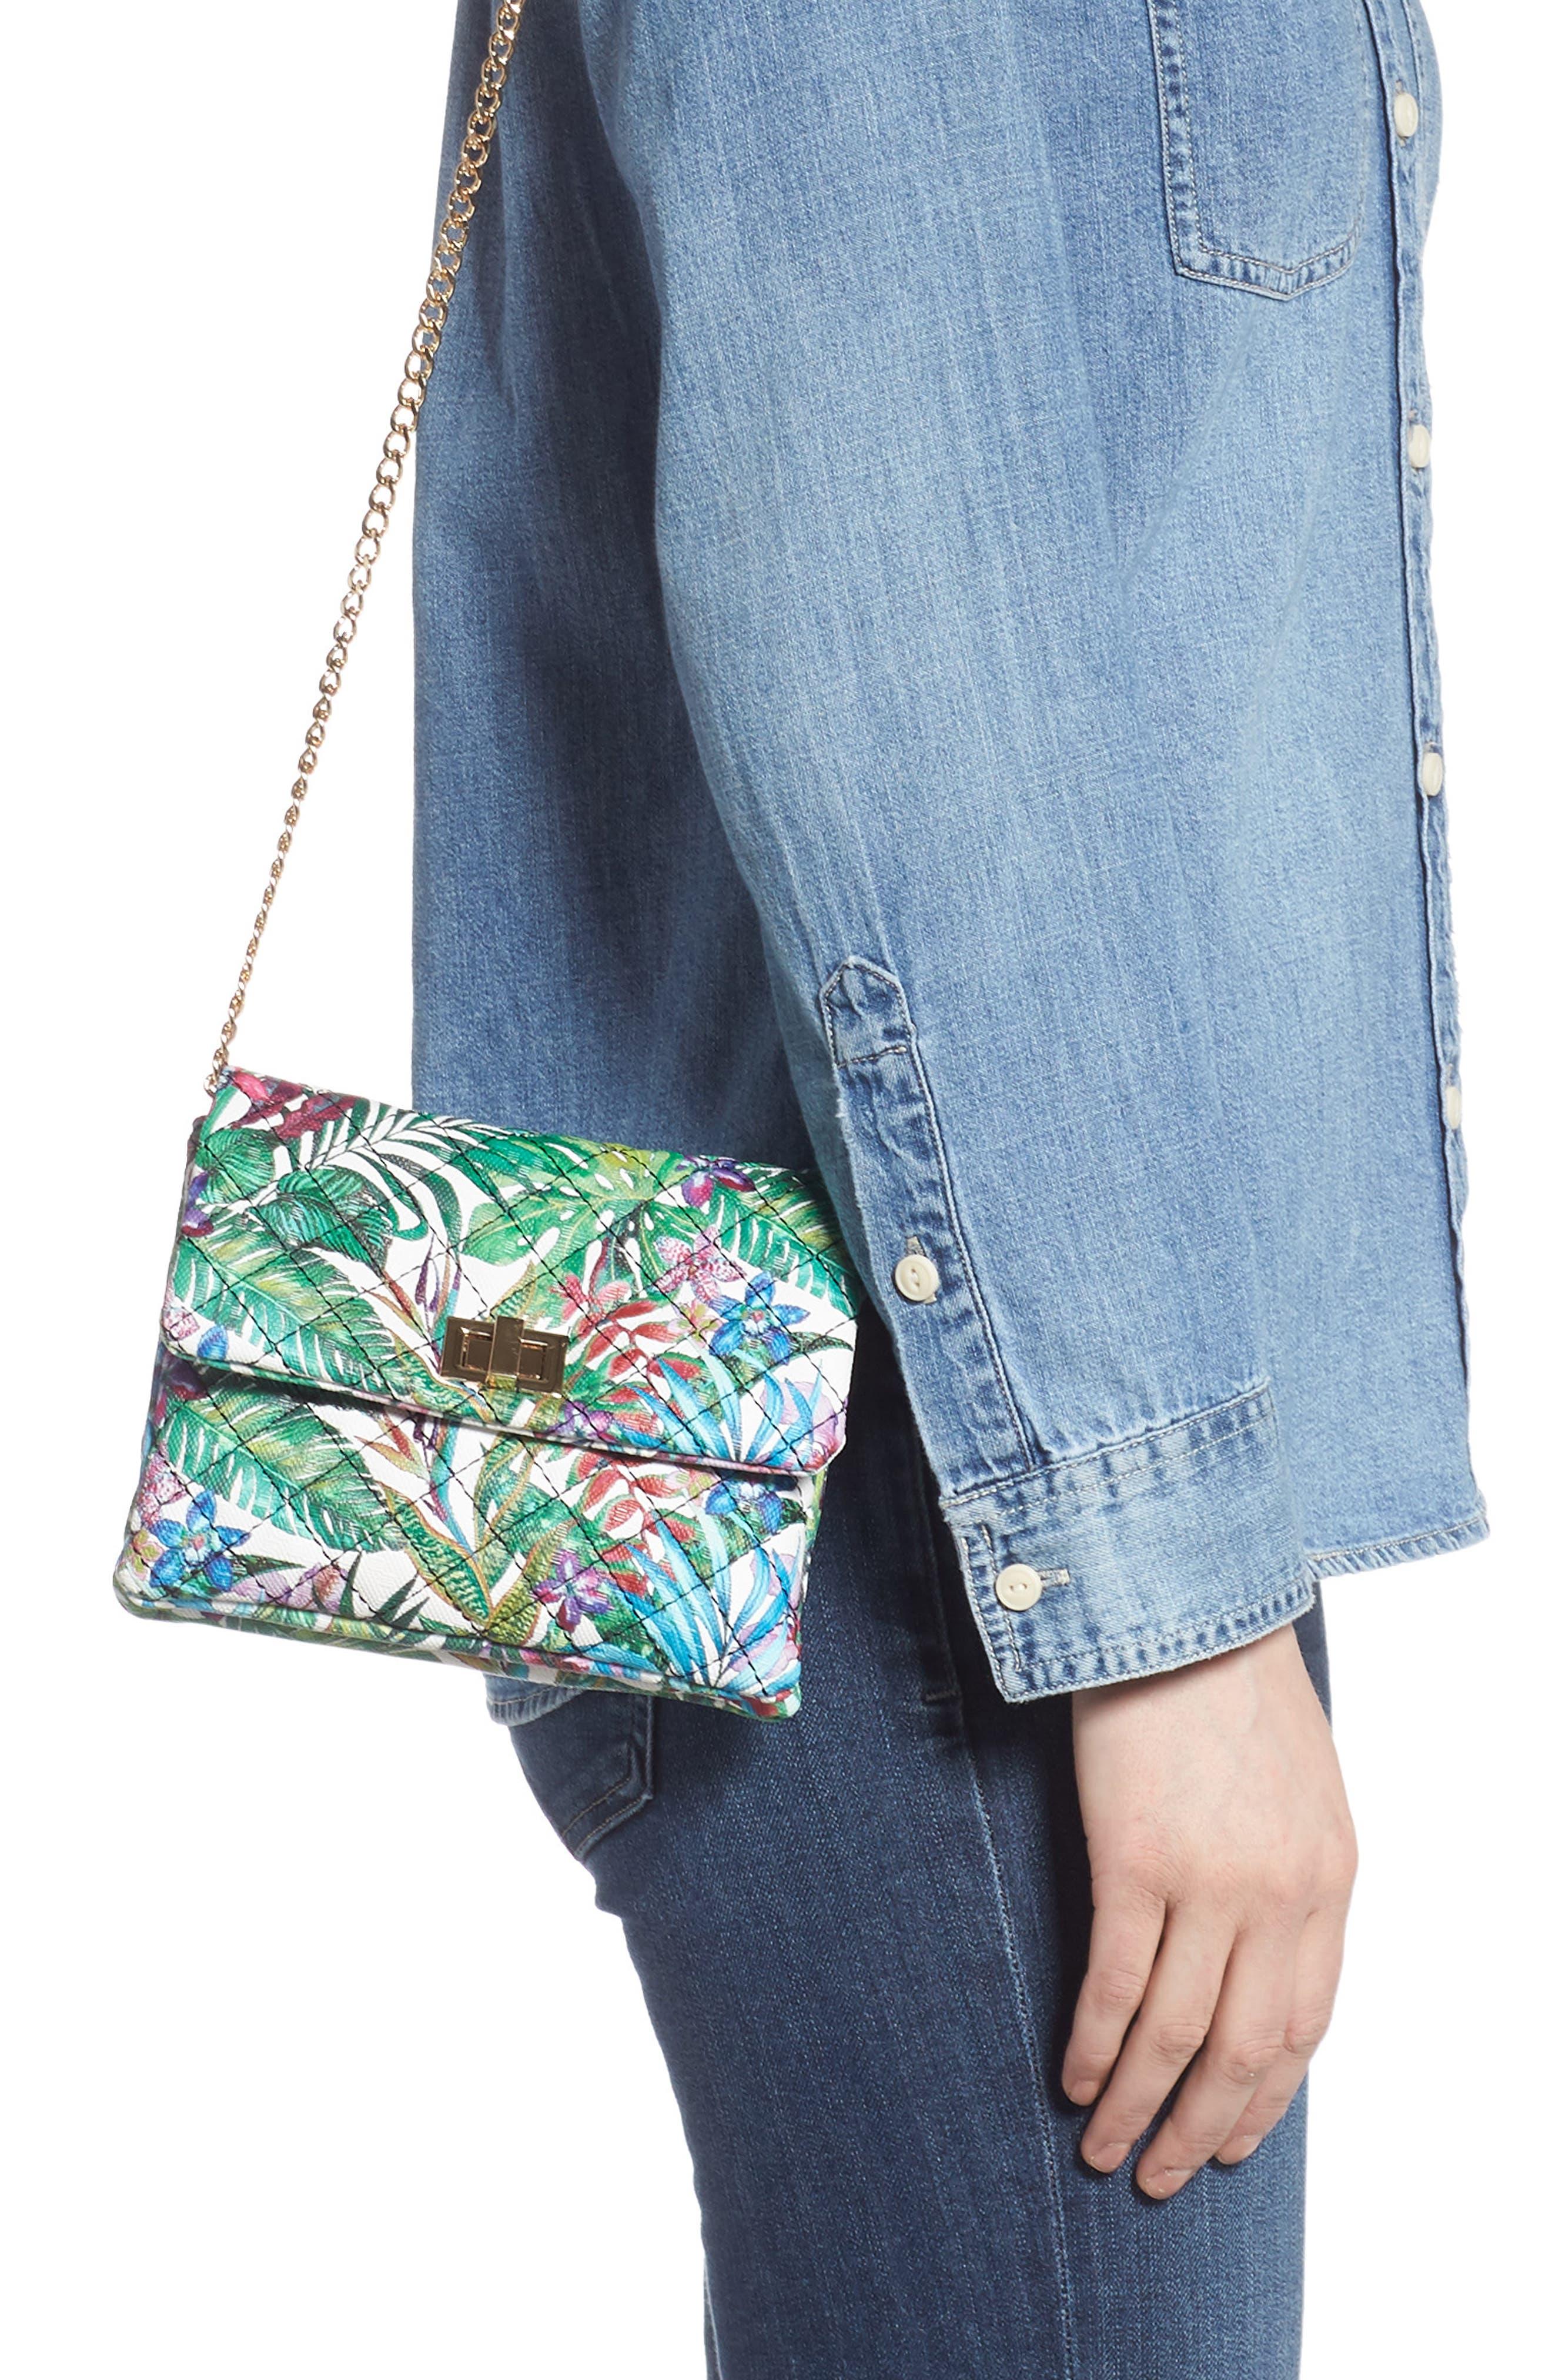 MALI + LILI,                             Quilted Vegan Leather Belt Bag,                             Alternate thumbnail 4, color,                             WHITE FLORAL